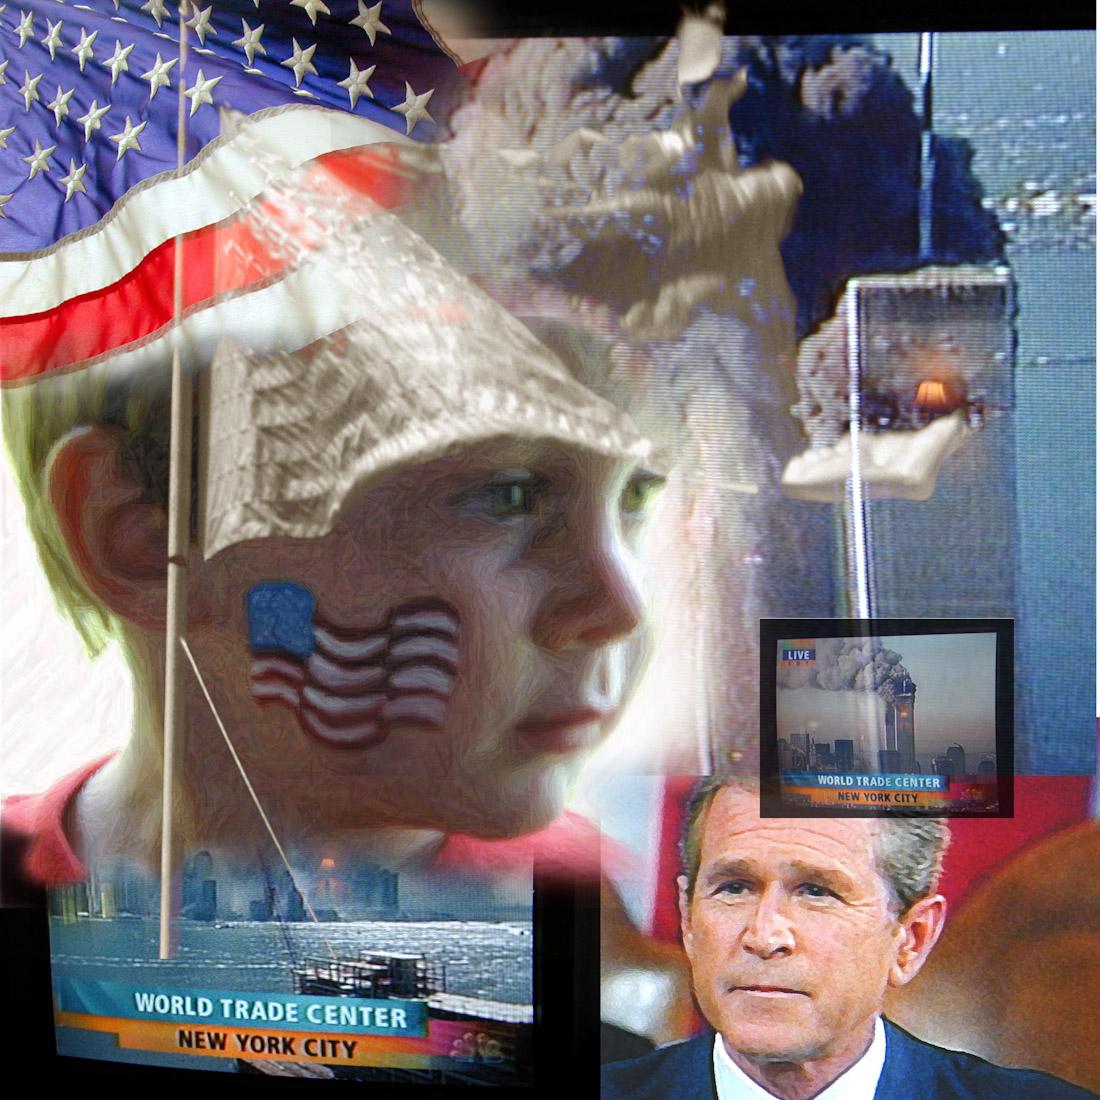 Looking back at 9-11